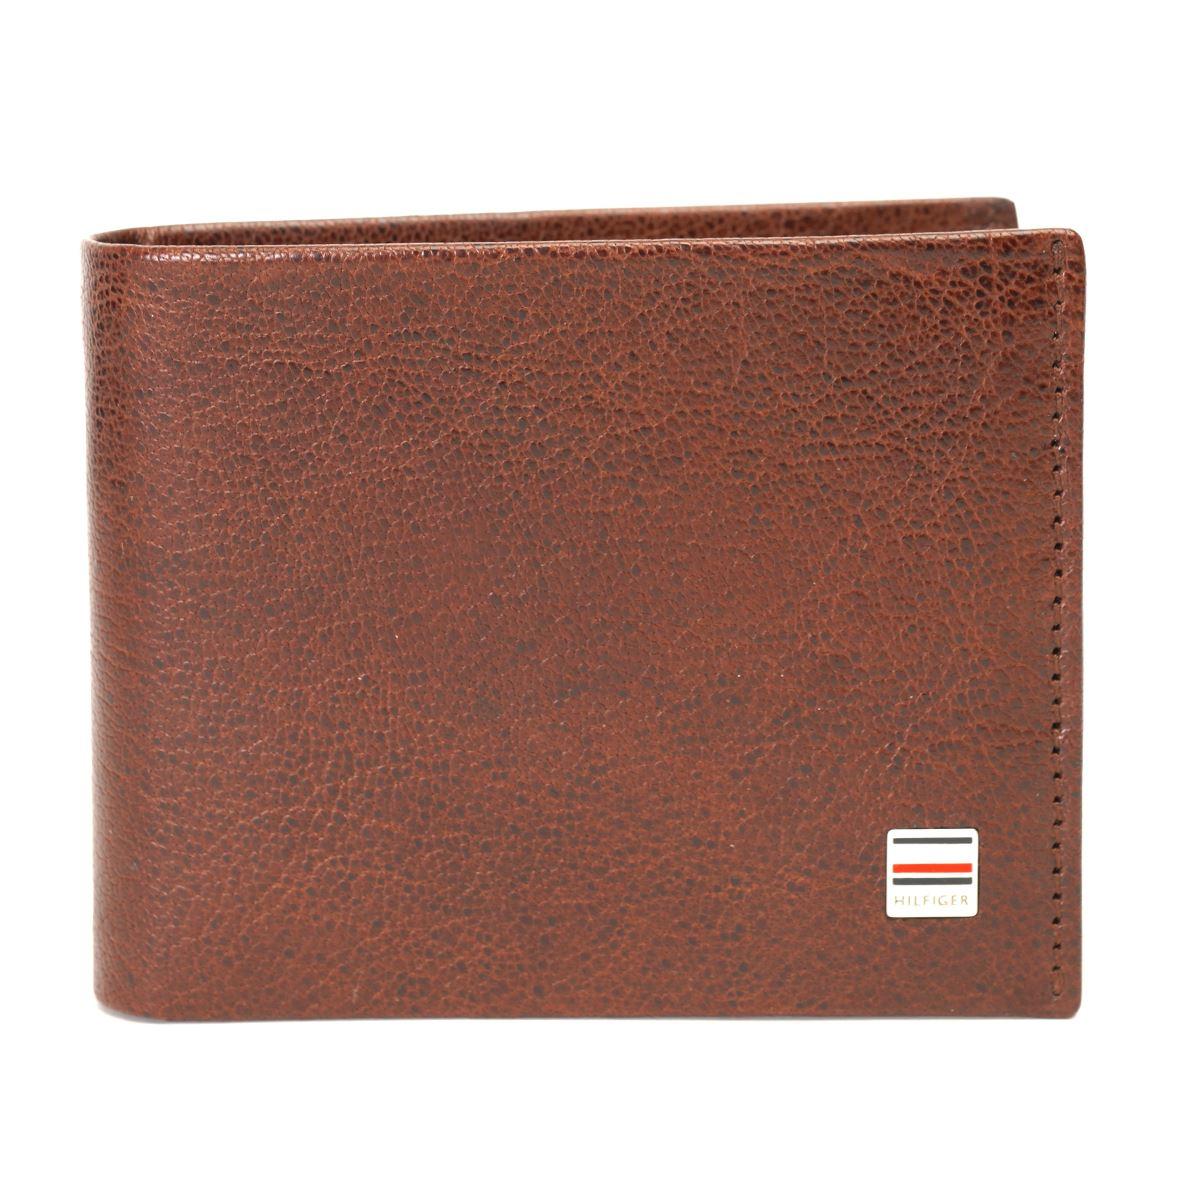 Tommy Hilfiger Leather Mens Textured Dark Brown James Global Coin Wallet